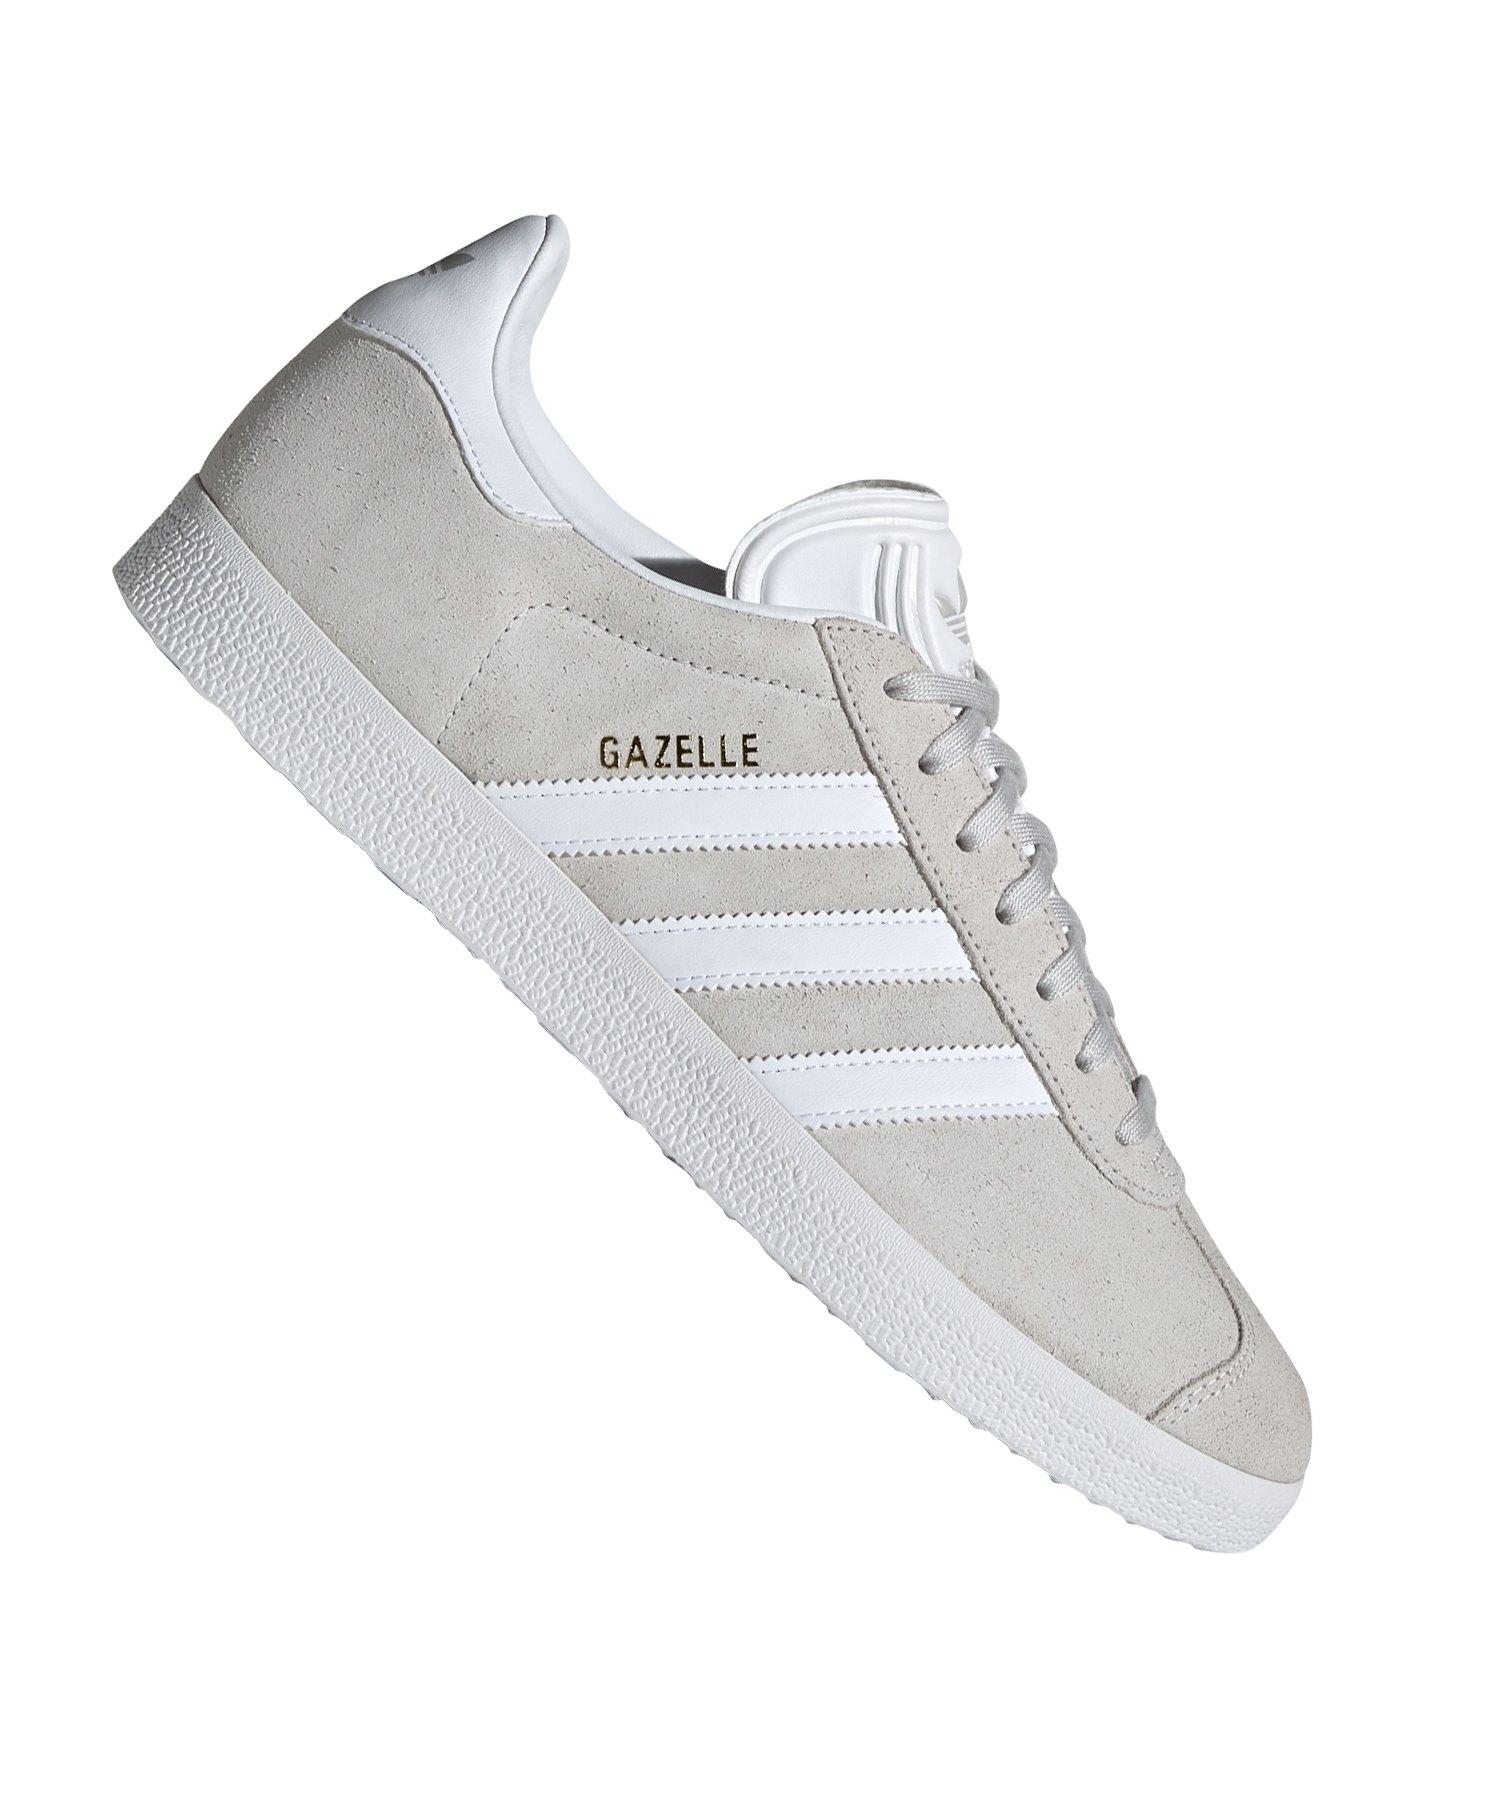 new product 807f6 17b33 adidas Originals Gazelle Sneaker Grau Weiss - Grau